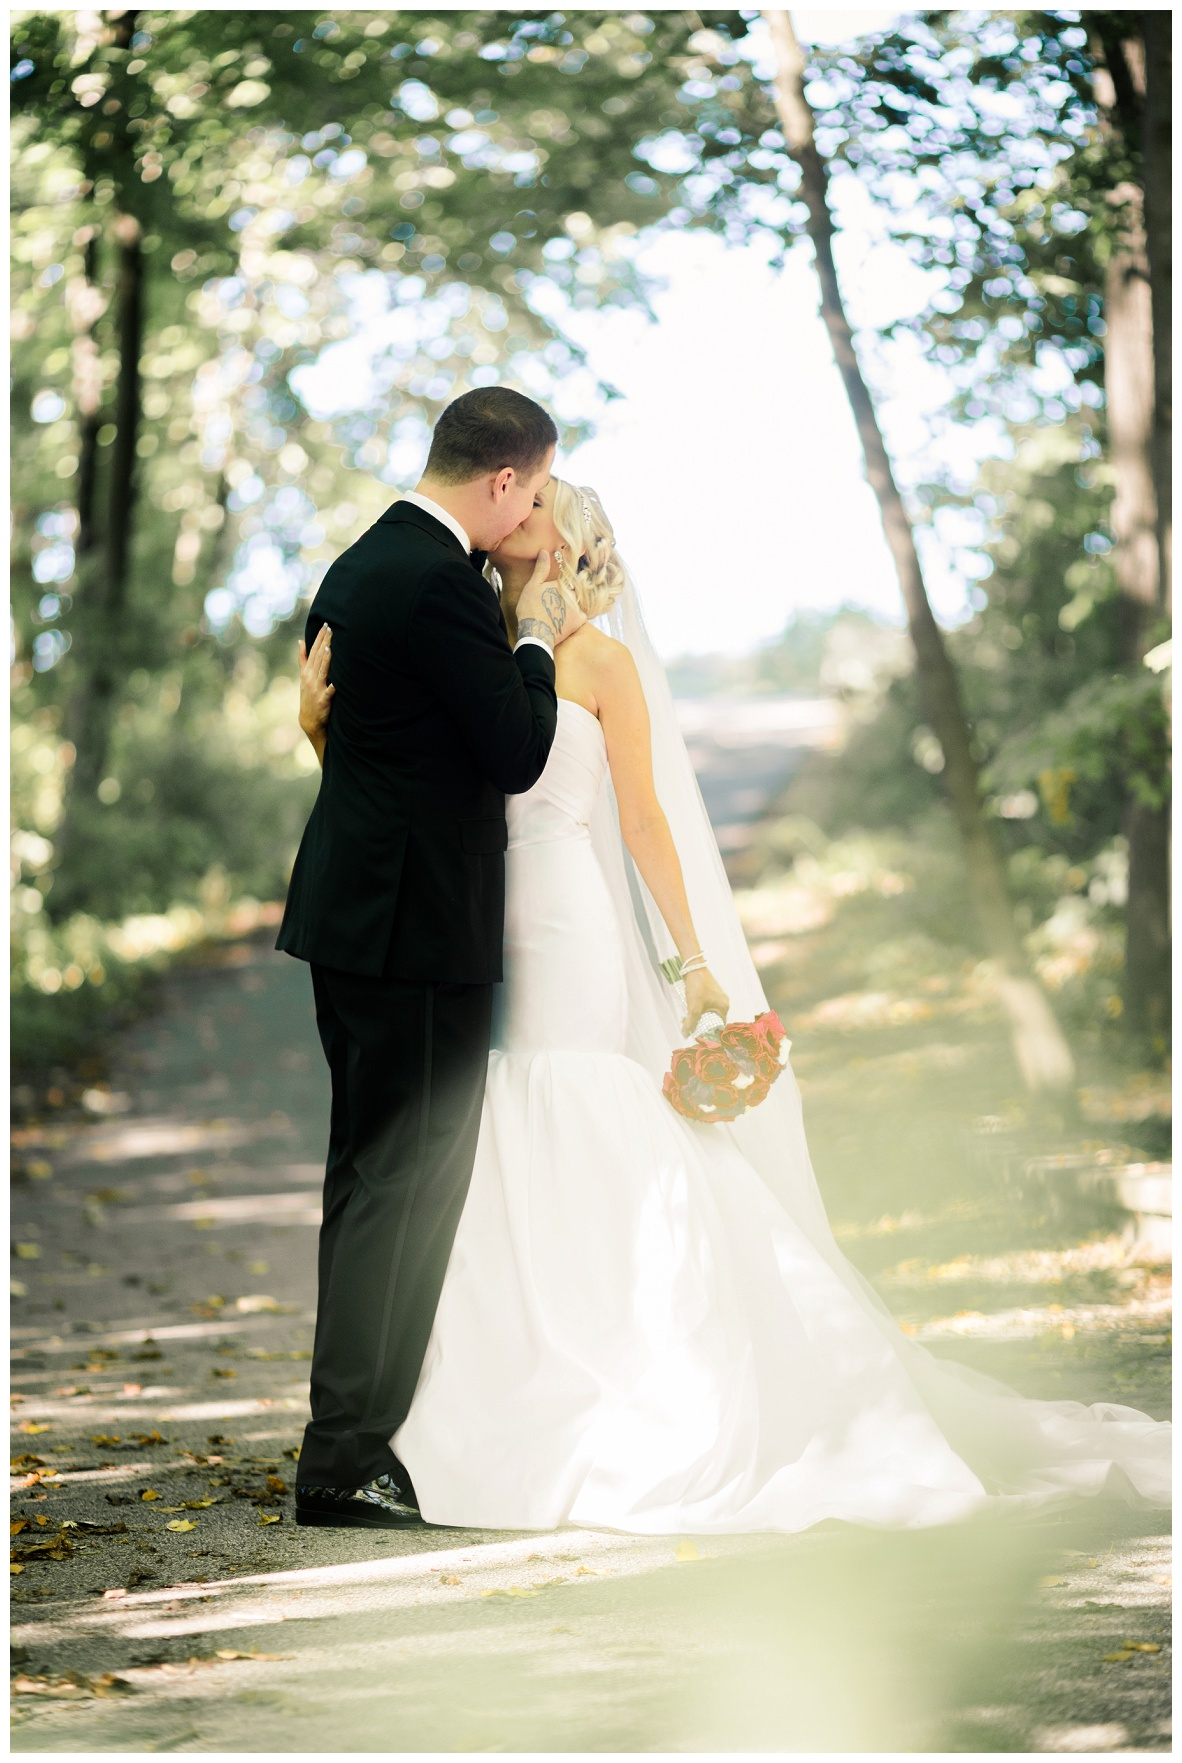 Mr. and Mrs. Papp_0030.jpg